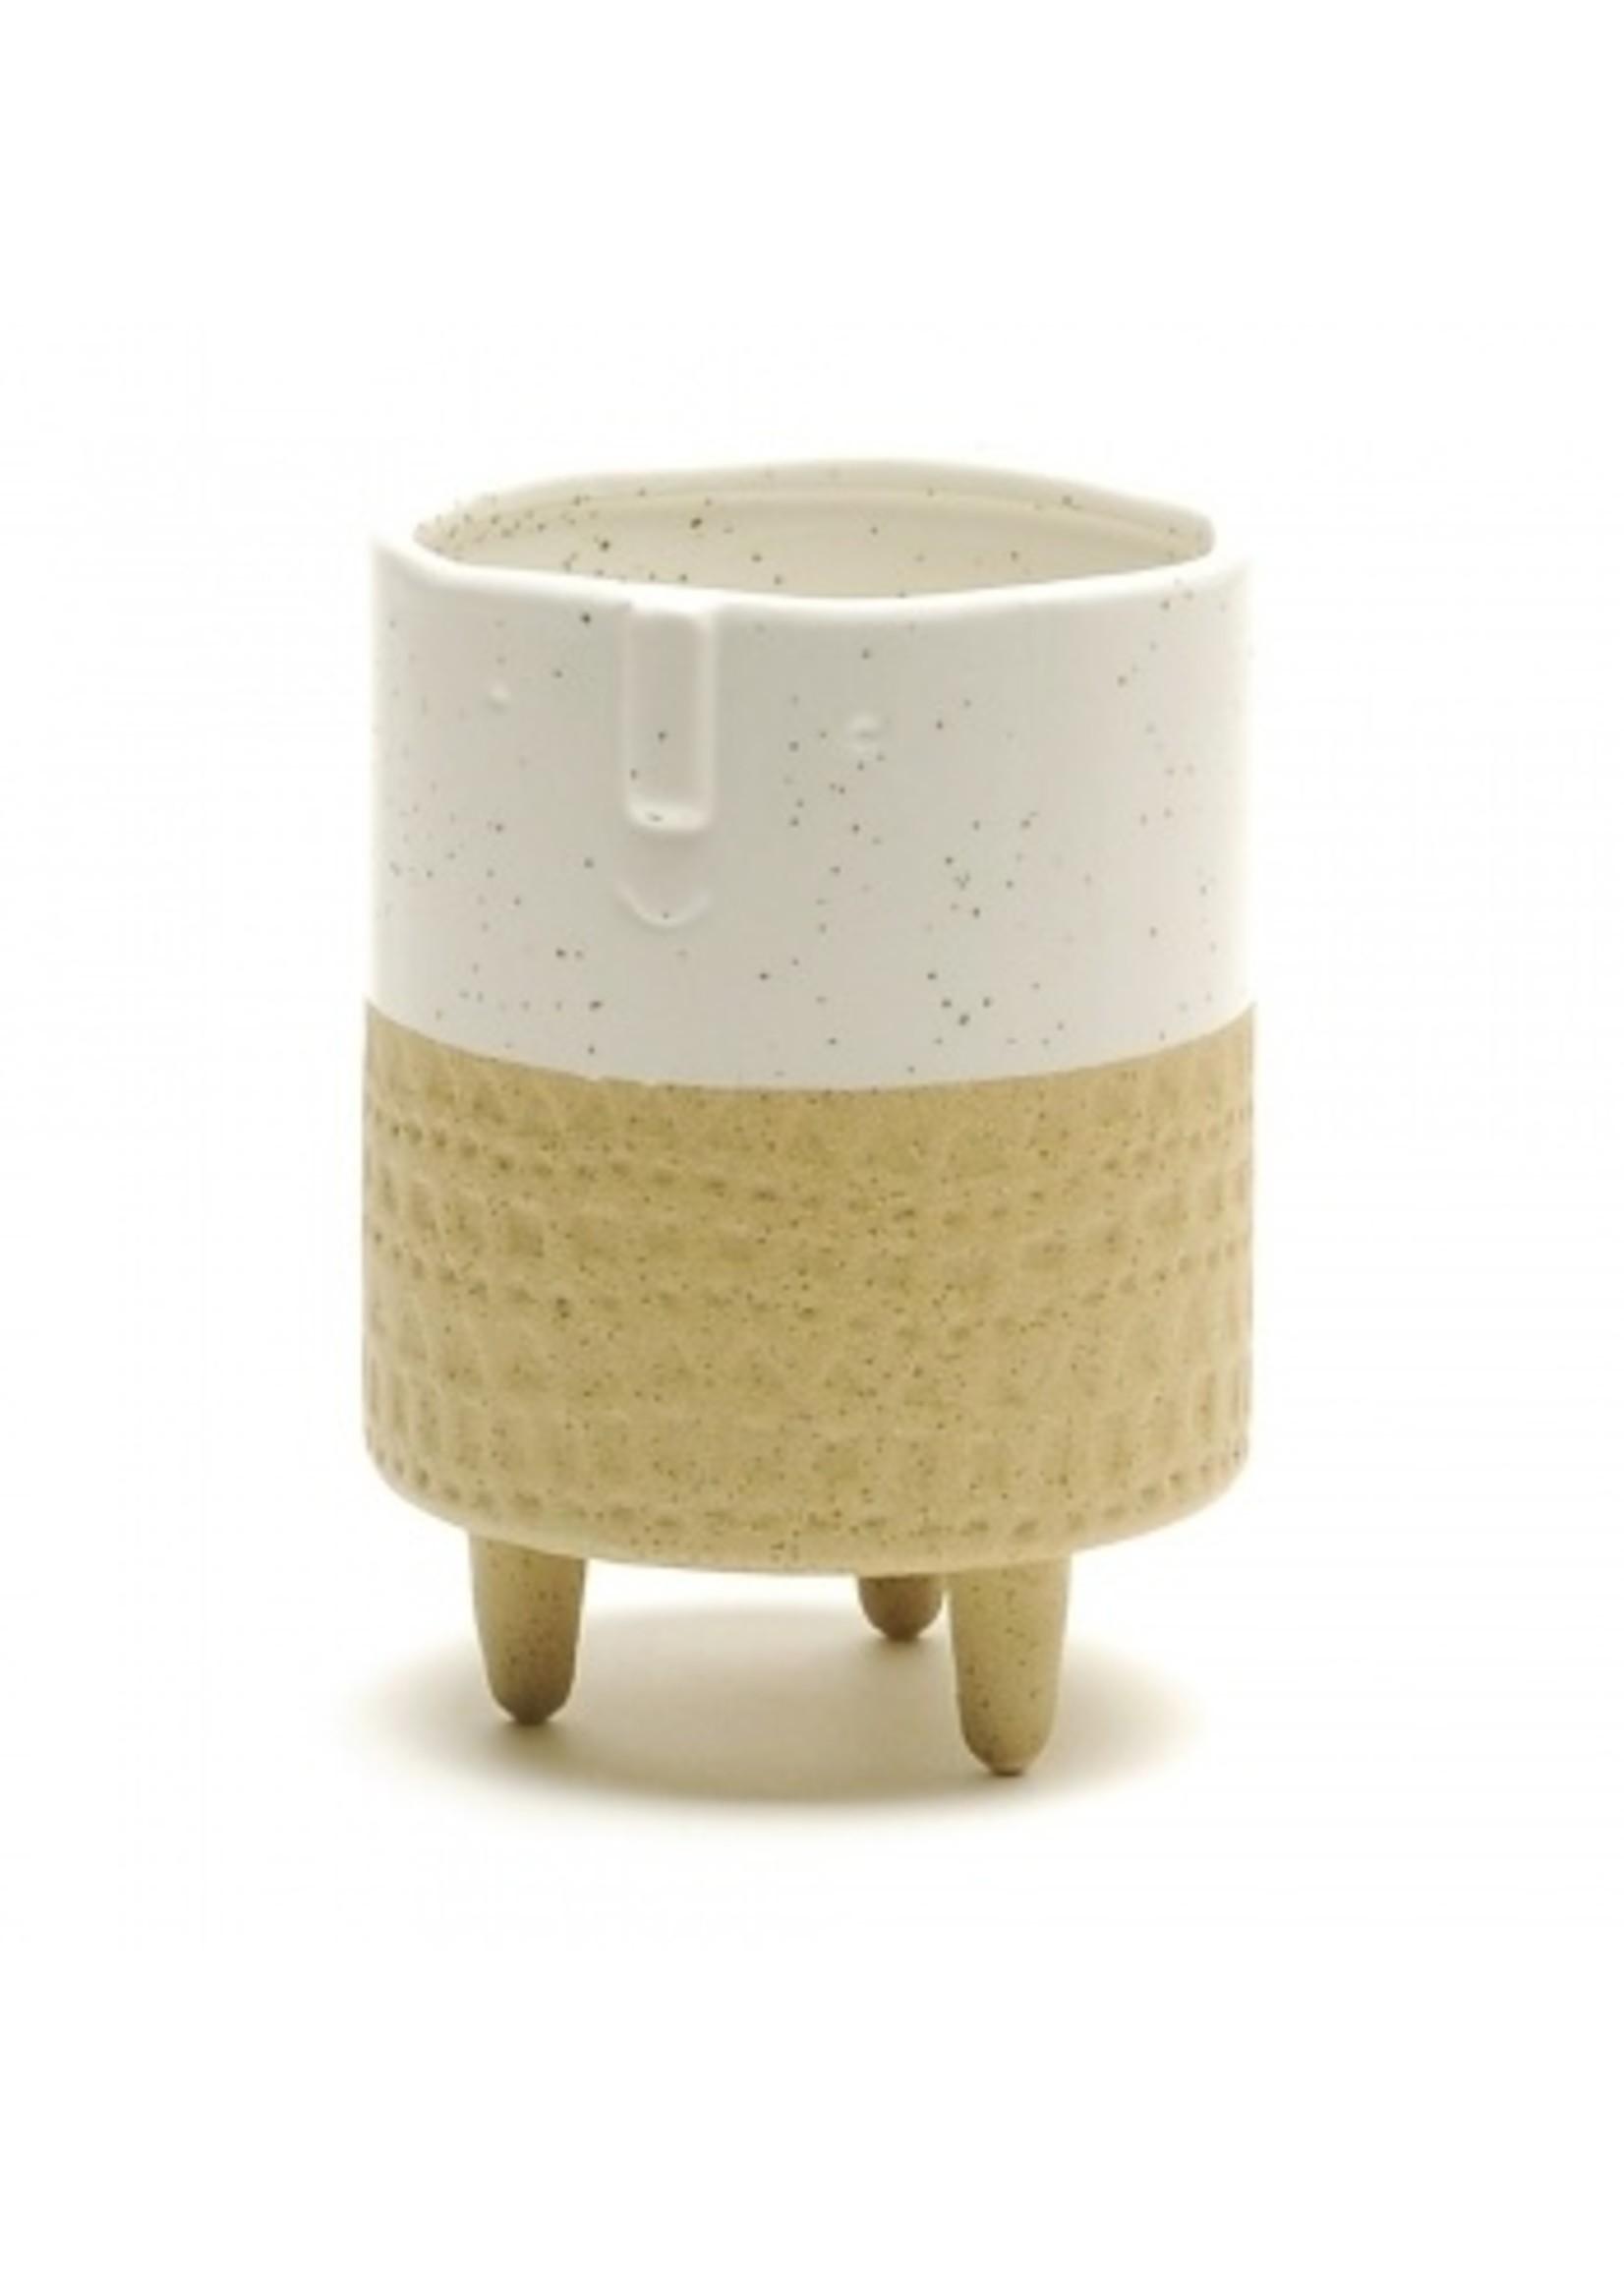 Two Tone Ceramic Face Pot